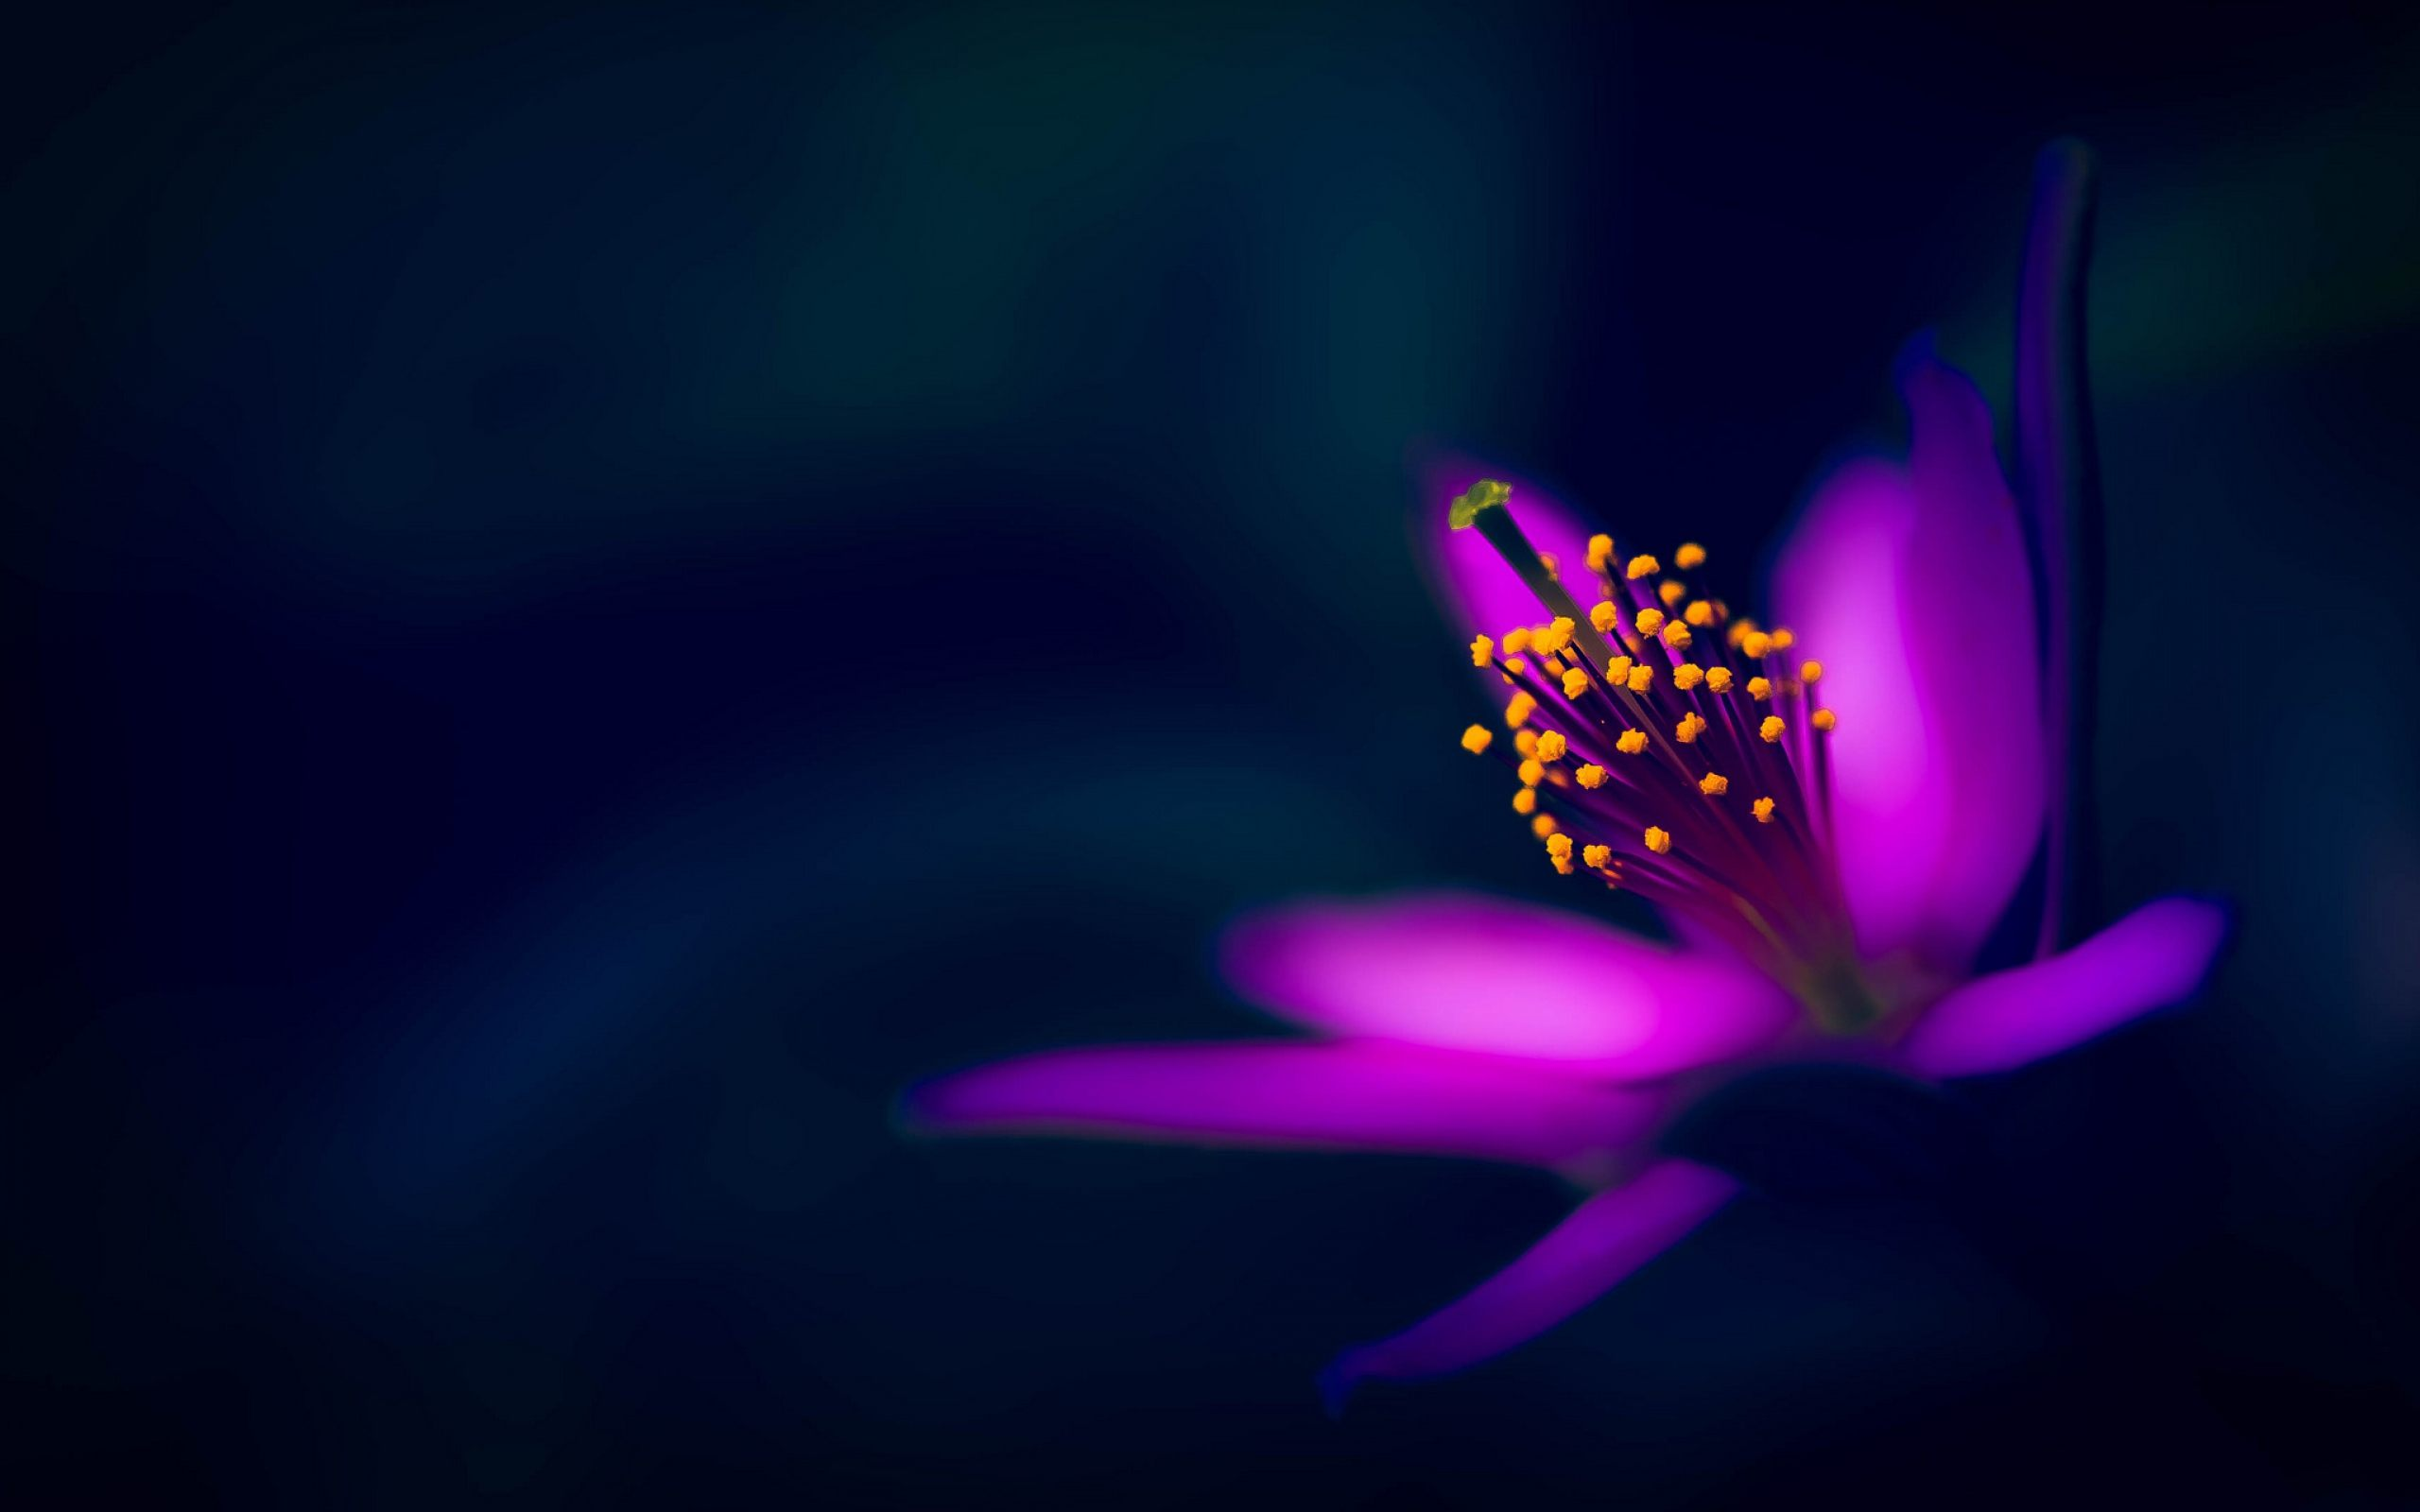 Wallpapers Purple Flower Images   Dark Flower Wallpaper Hd Hd 2560x1600